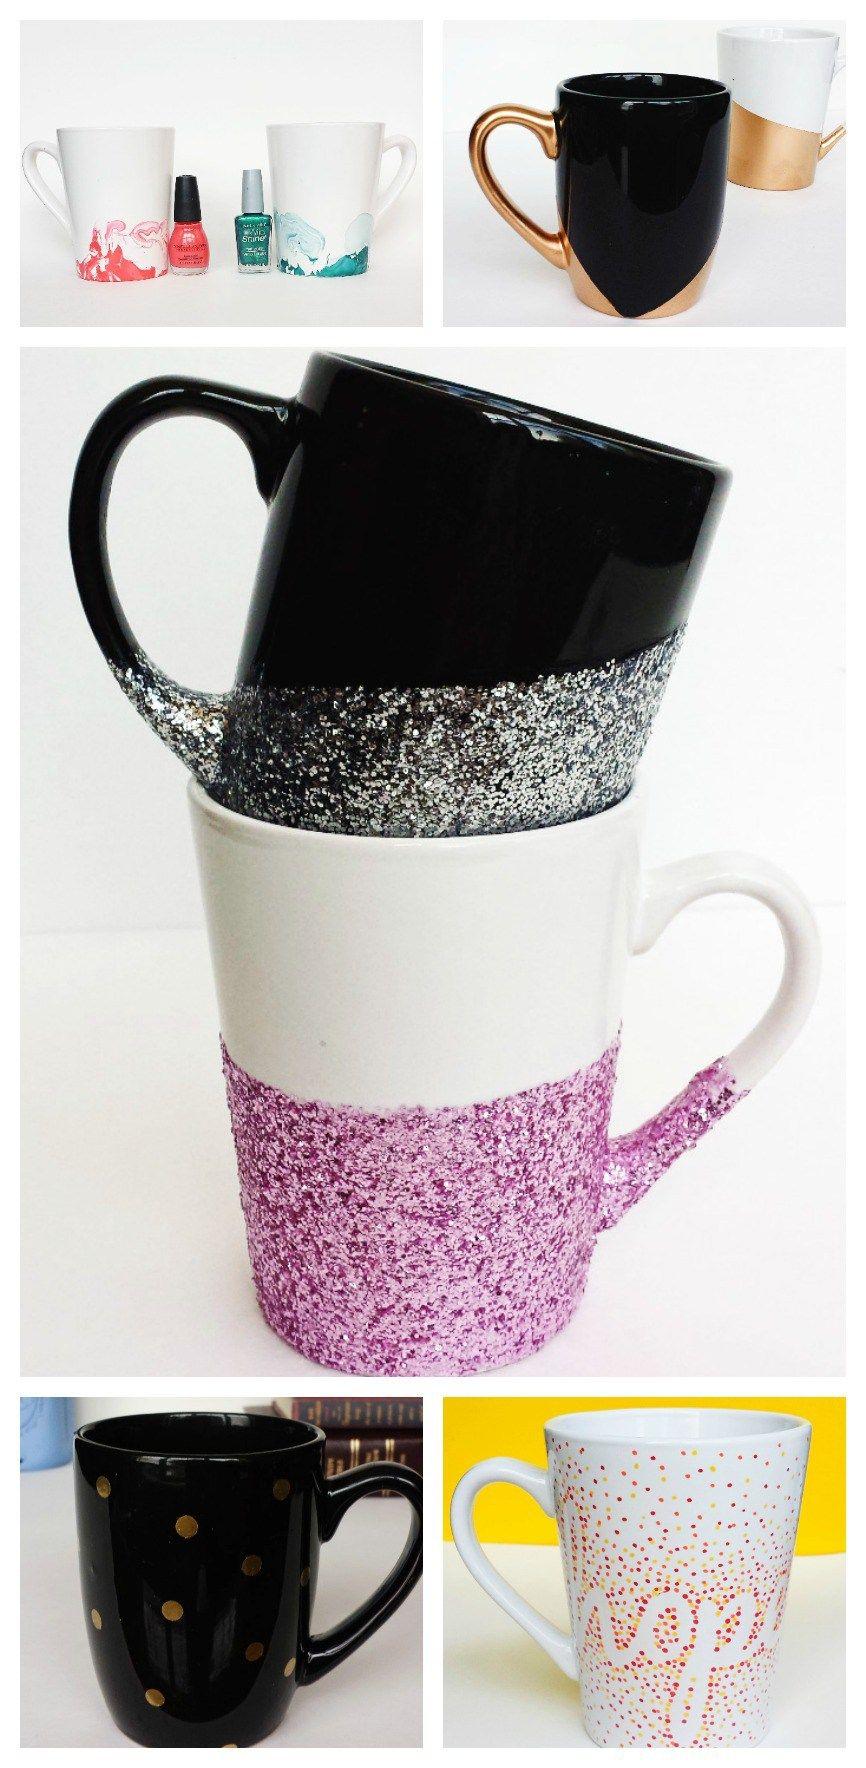 10Minute Mugs 7 Easy DIY Mug Tutorials Diy mug designs